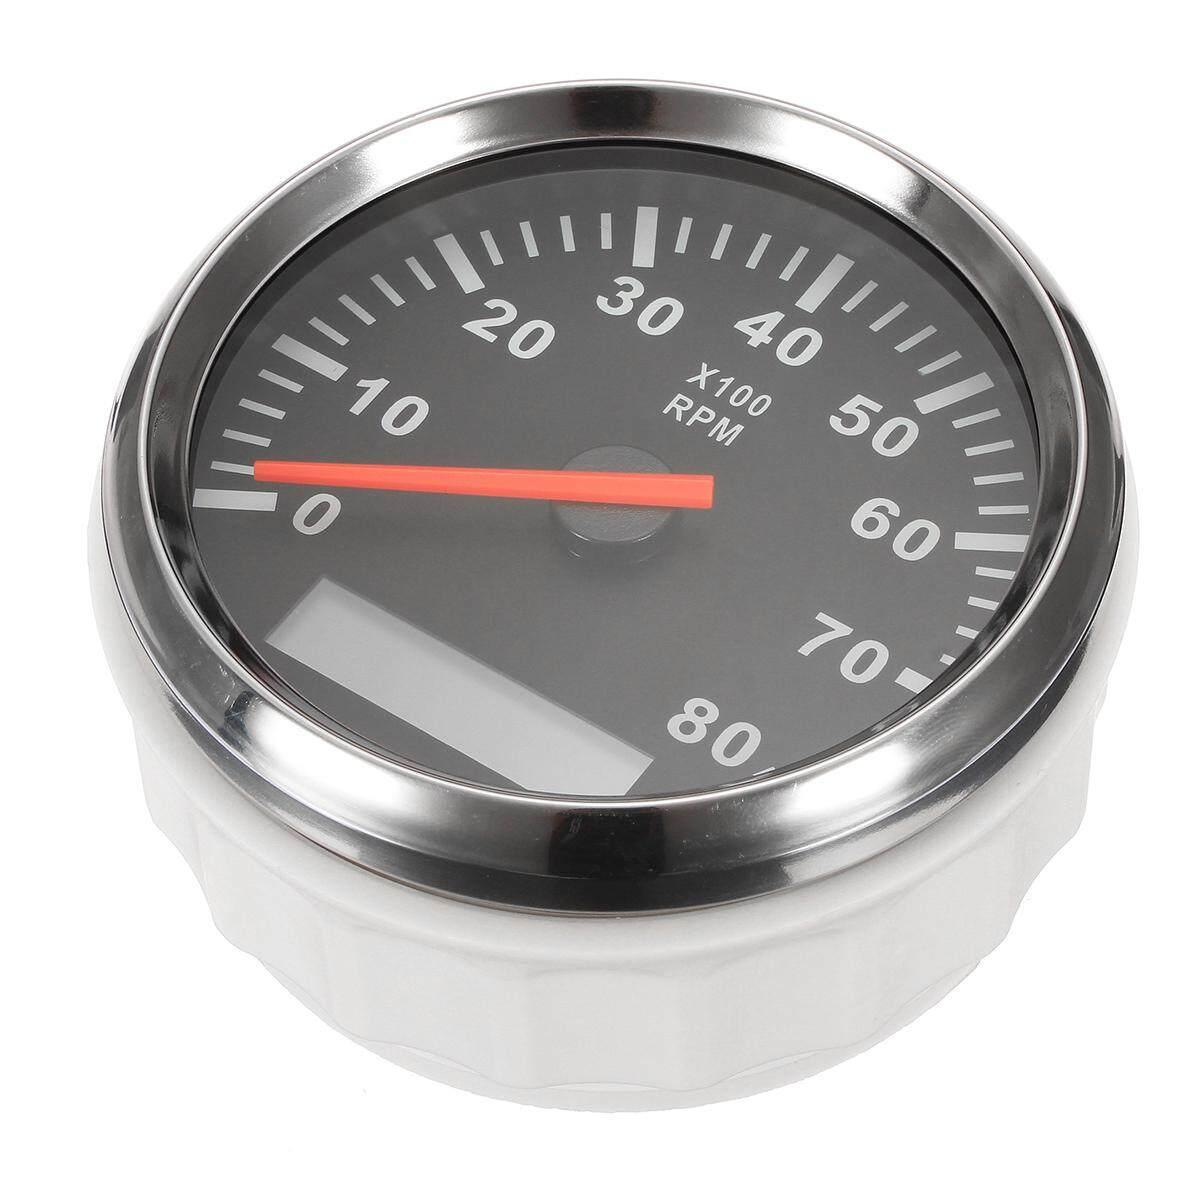 hight resolution of product details of kus boat tachometer marine tacho meter gauge lcd hourmeter 12v 24v 8000 rpm 85mm intl convenient installation